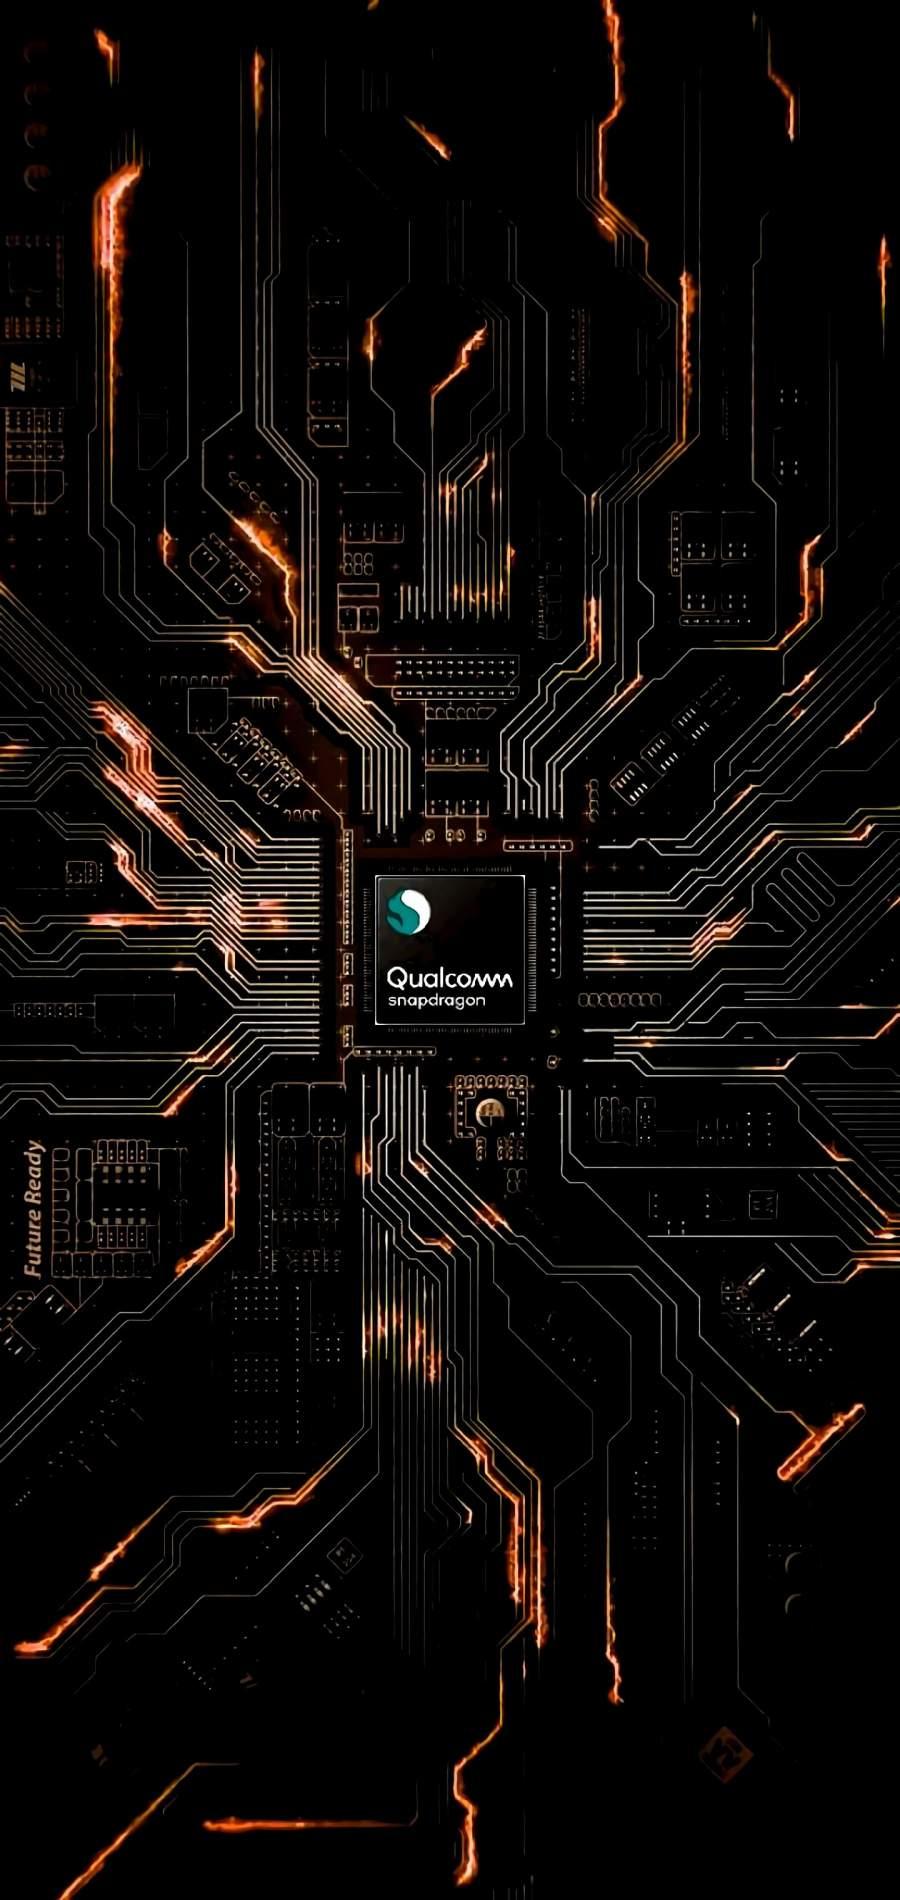 Qualcomm Snapdragon Motherboard